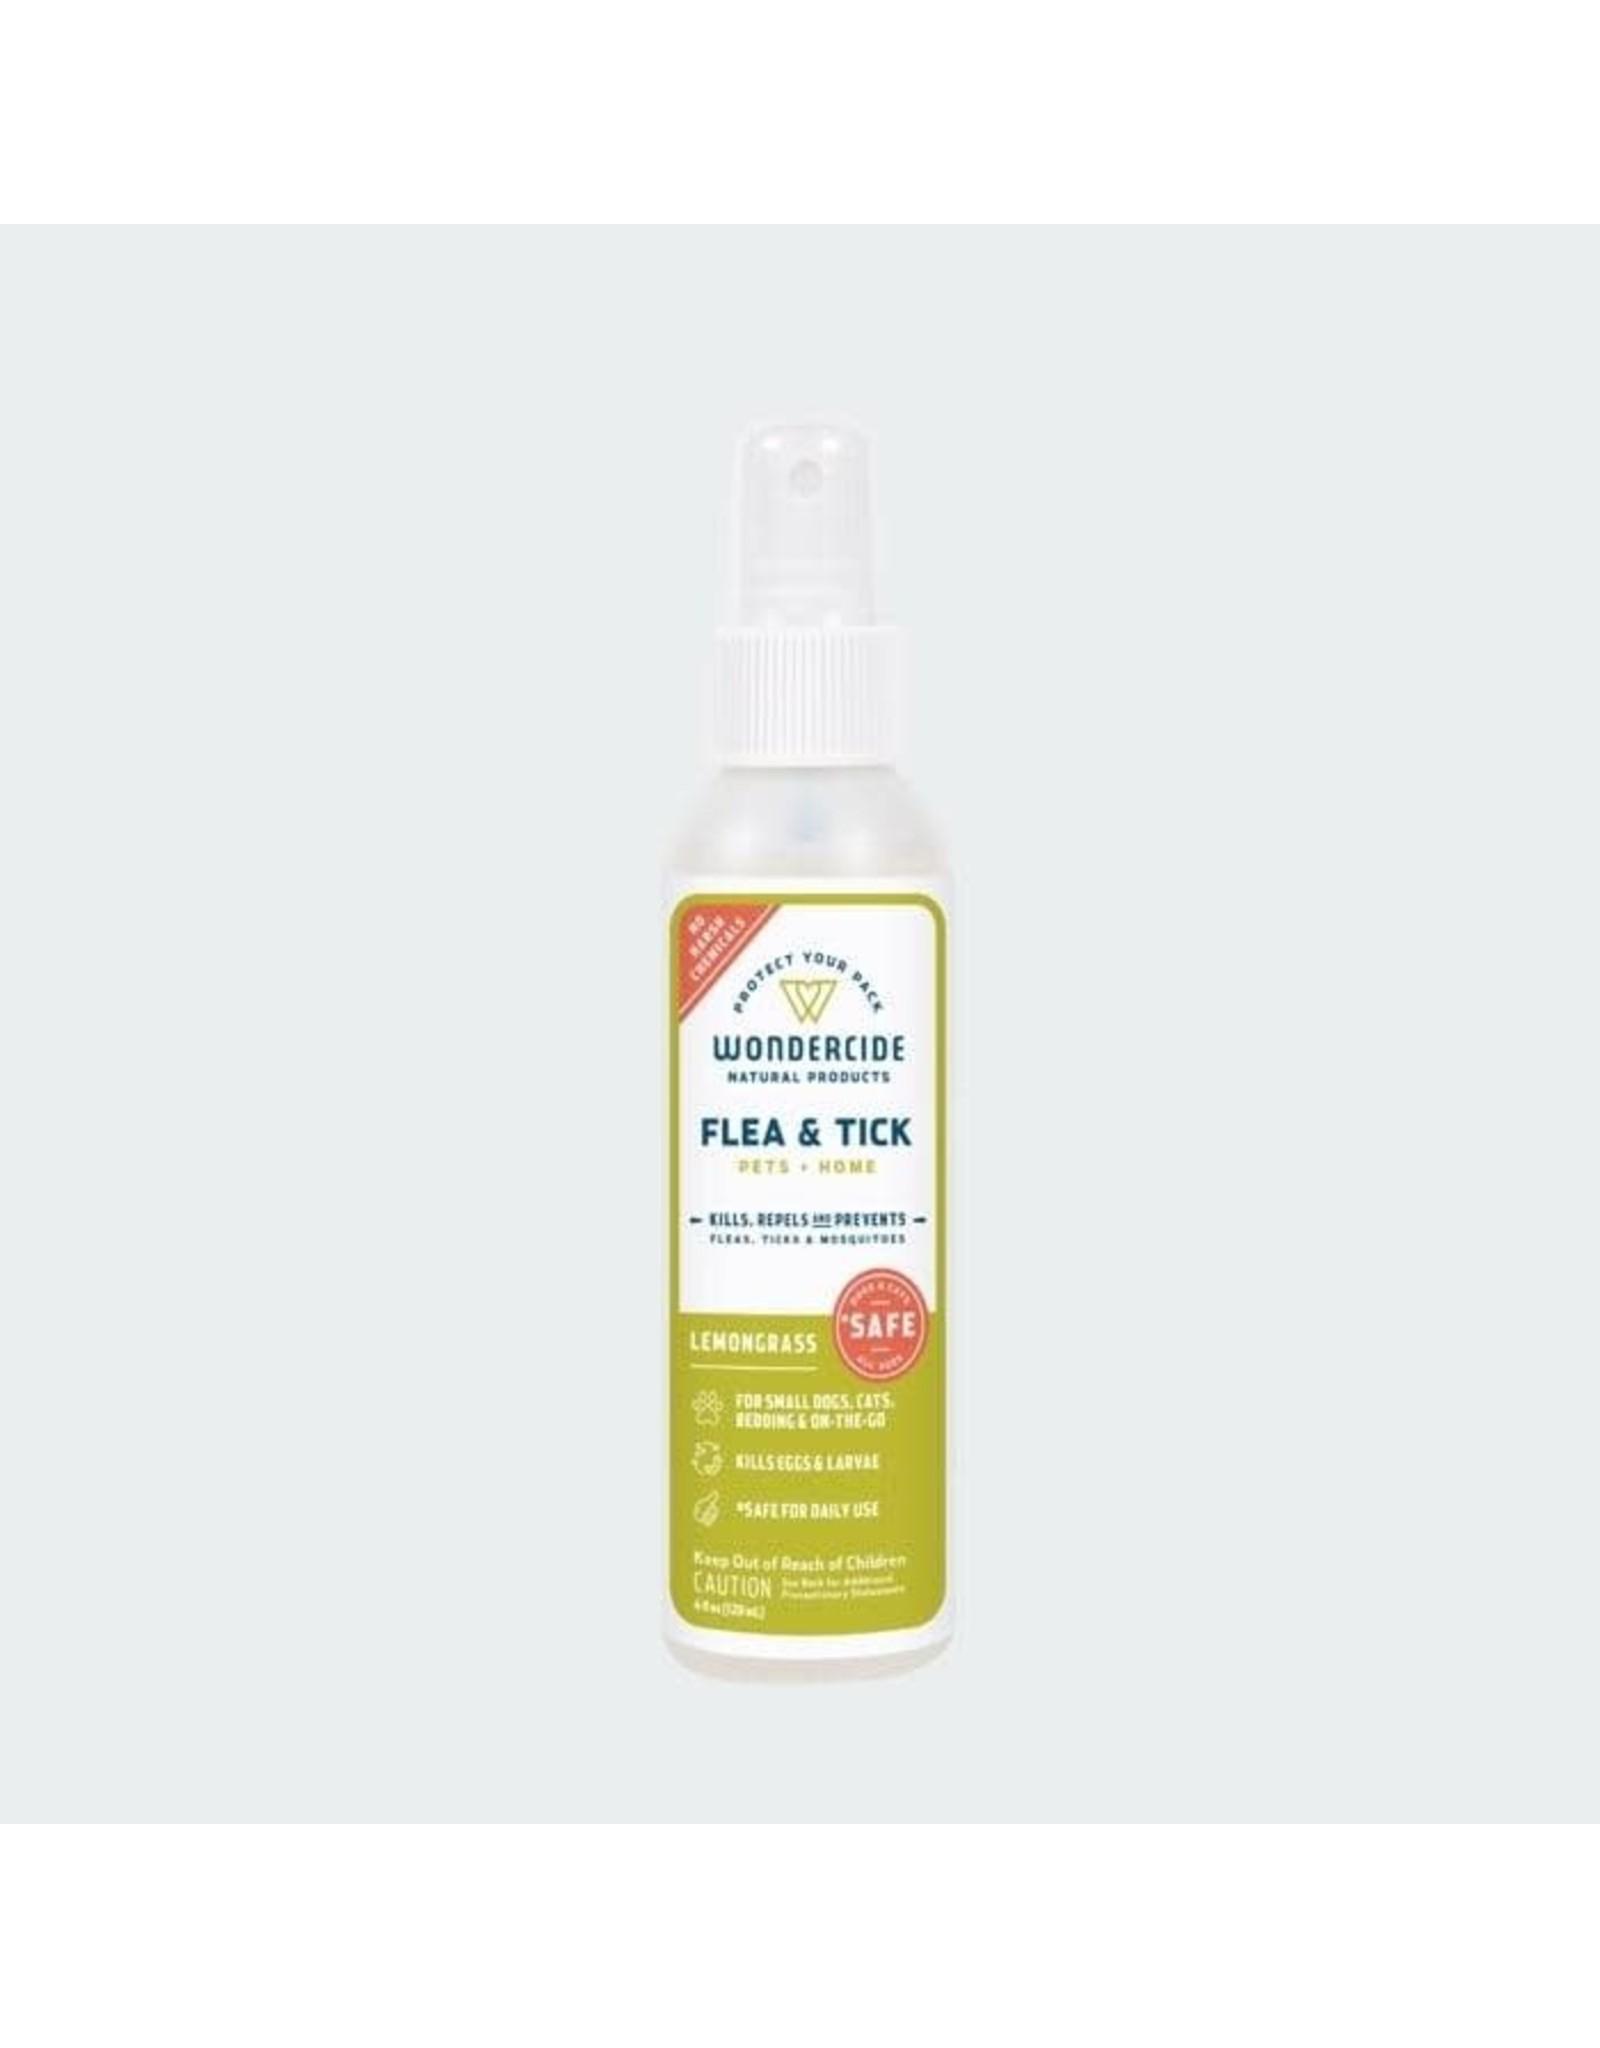 Wondercide Wondercide Flea, Tick & Mosquito Spray: Lemongrass, 4 oz